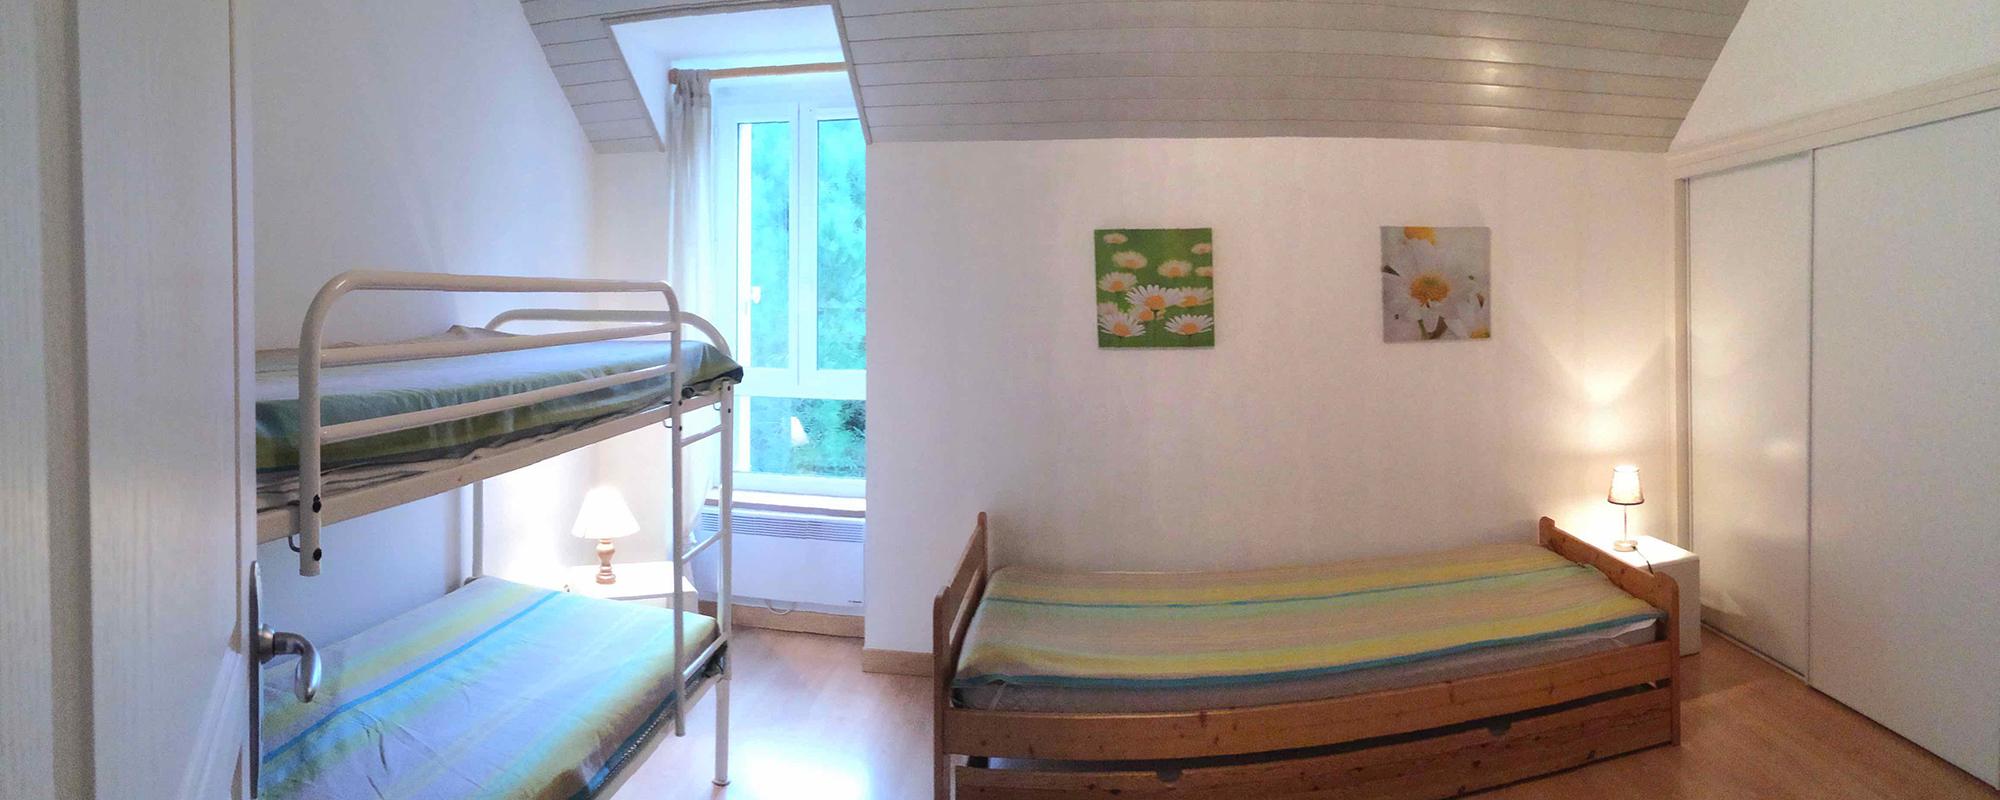 Première chambre enfants